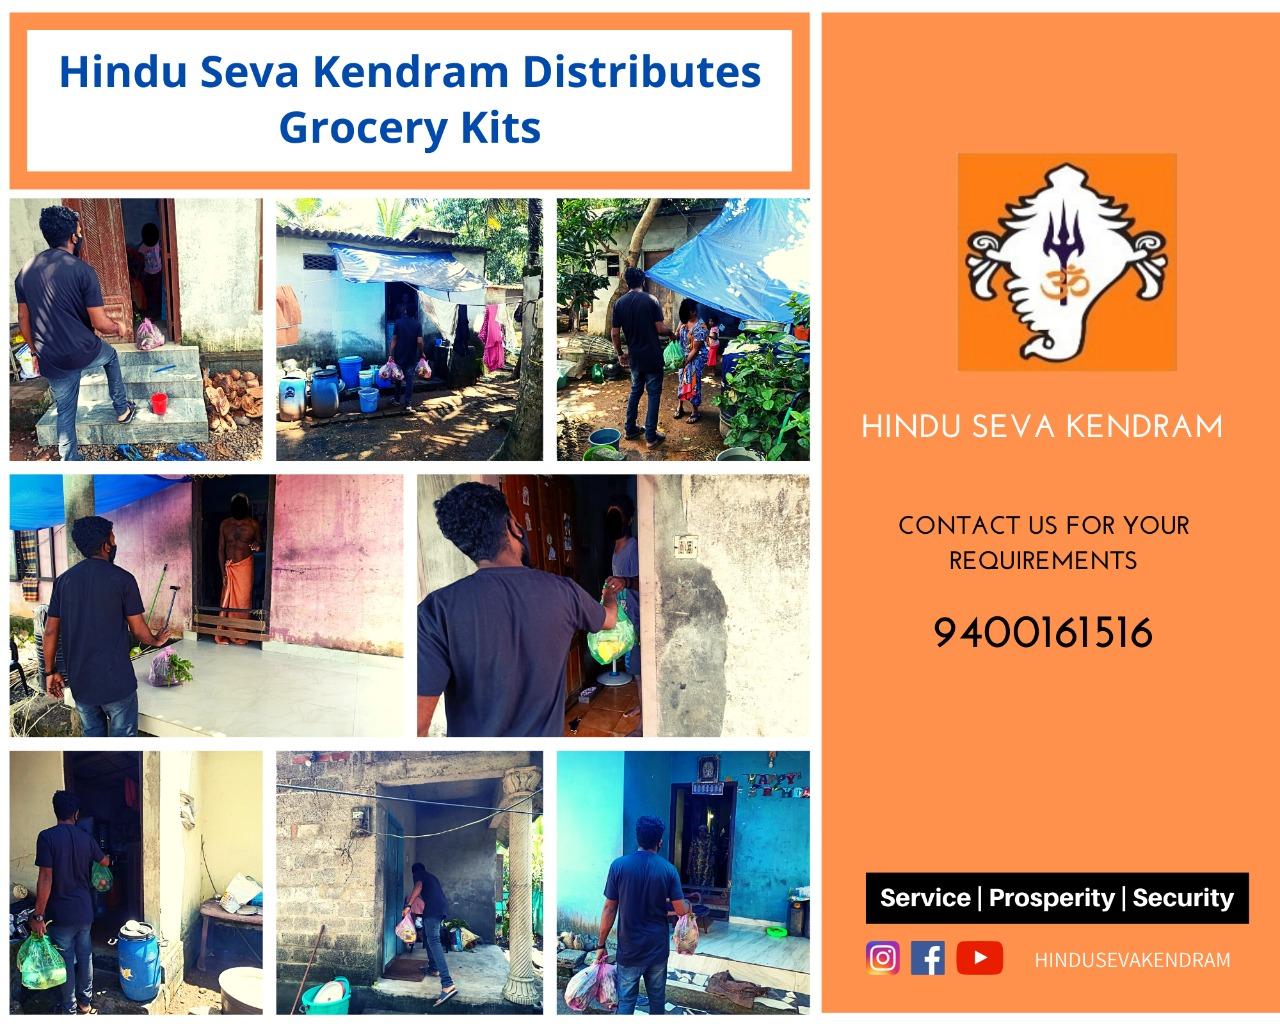 Hindu Seva Kendram Distributes Grocery Kits